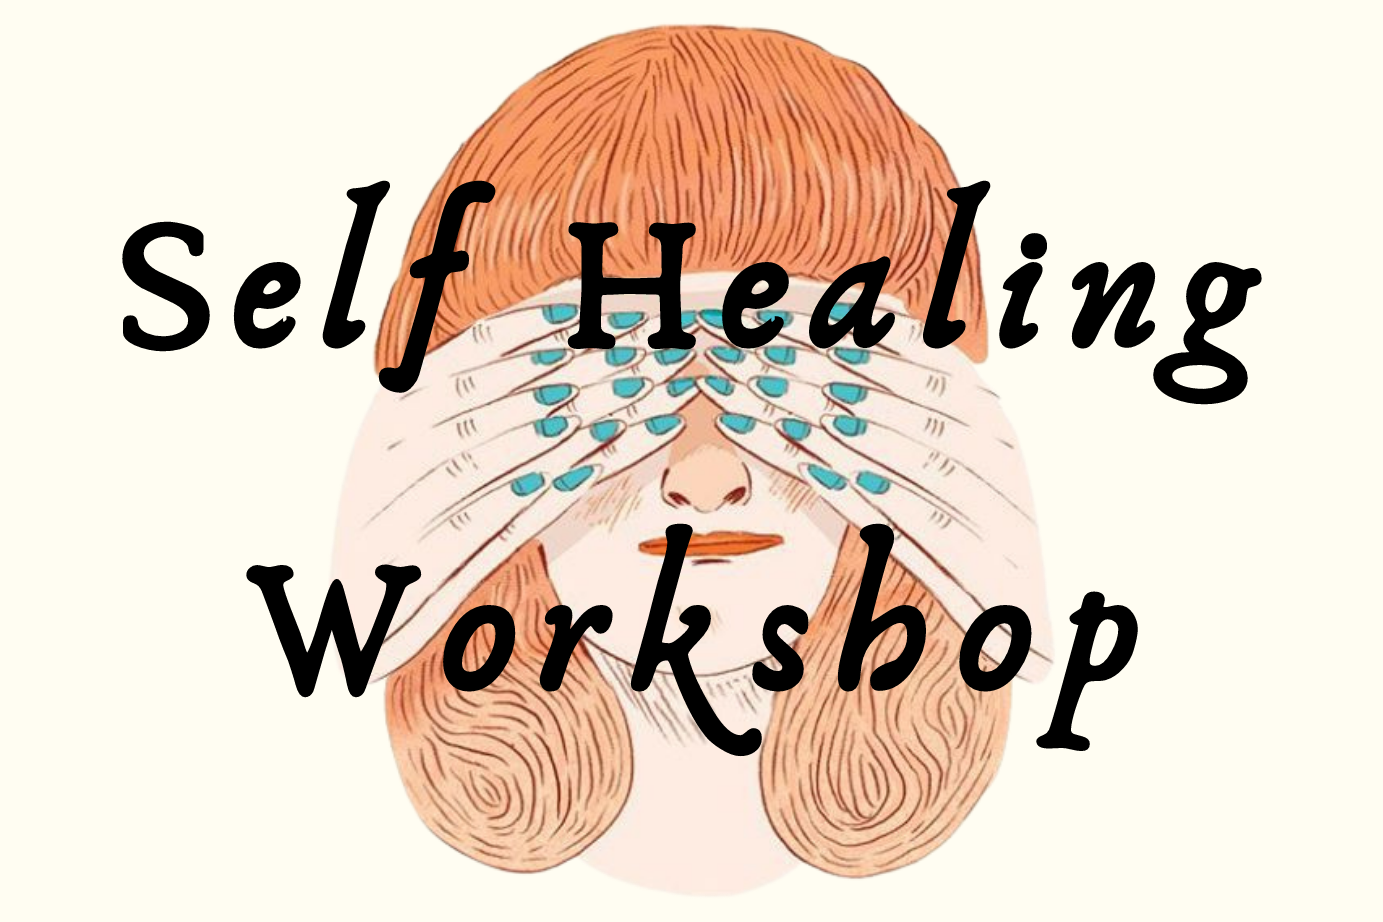 Five Elements of Self Healing